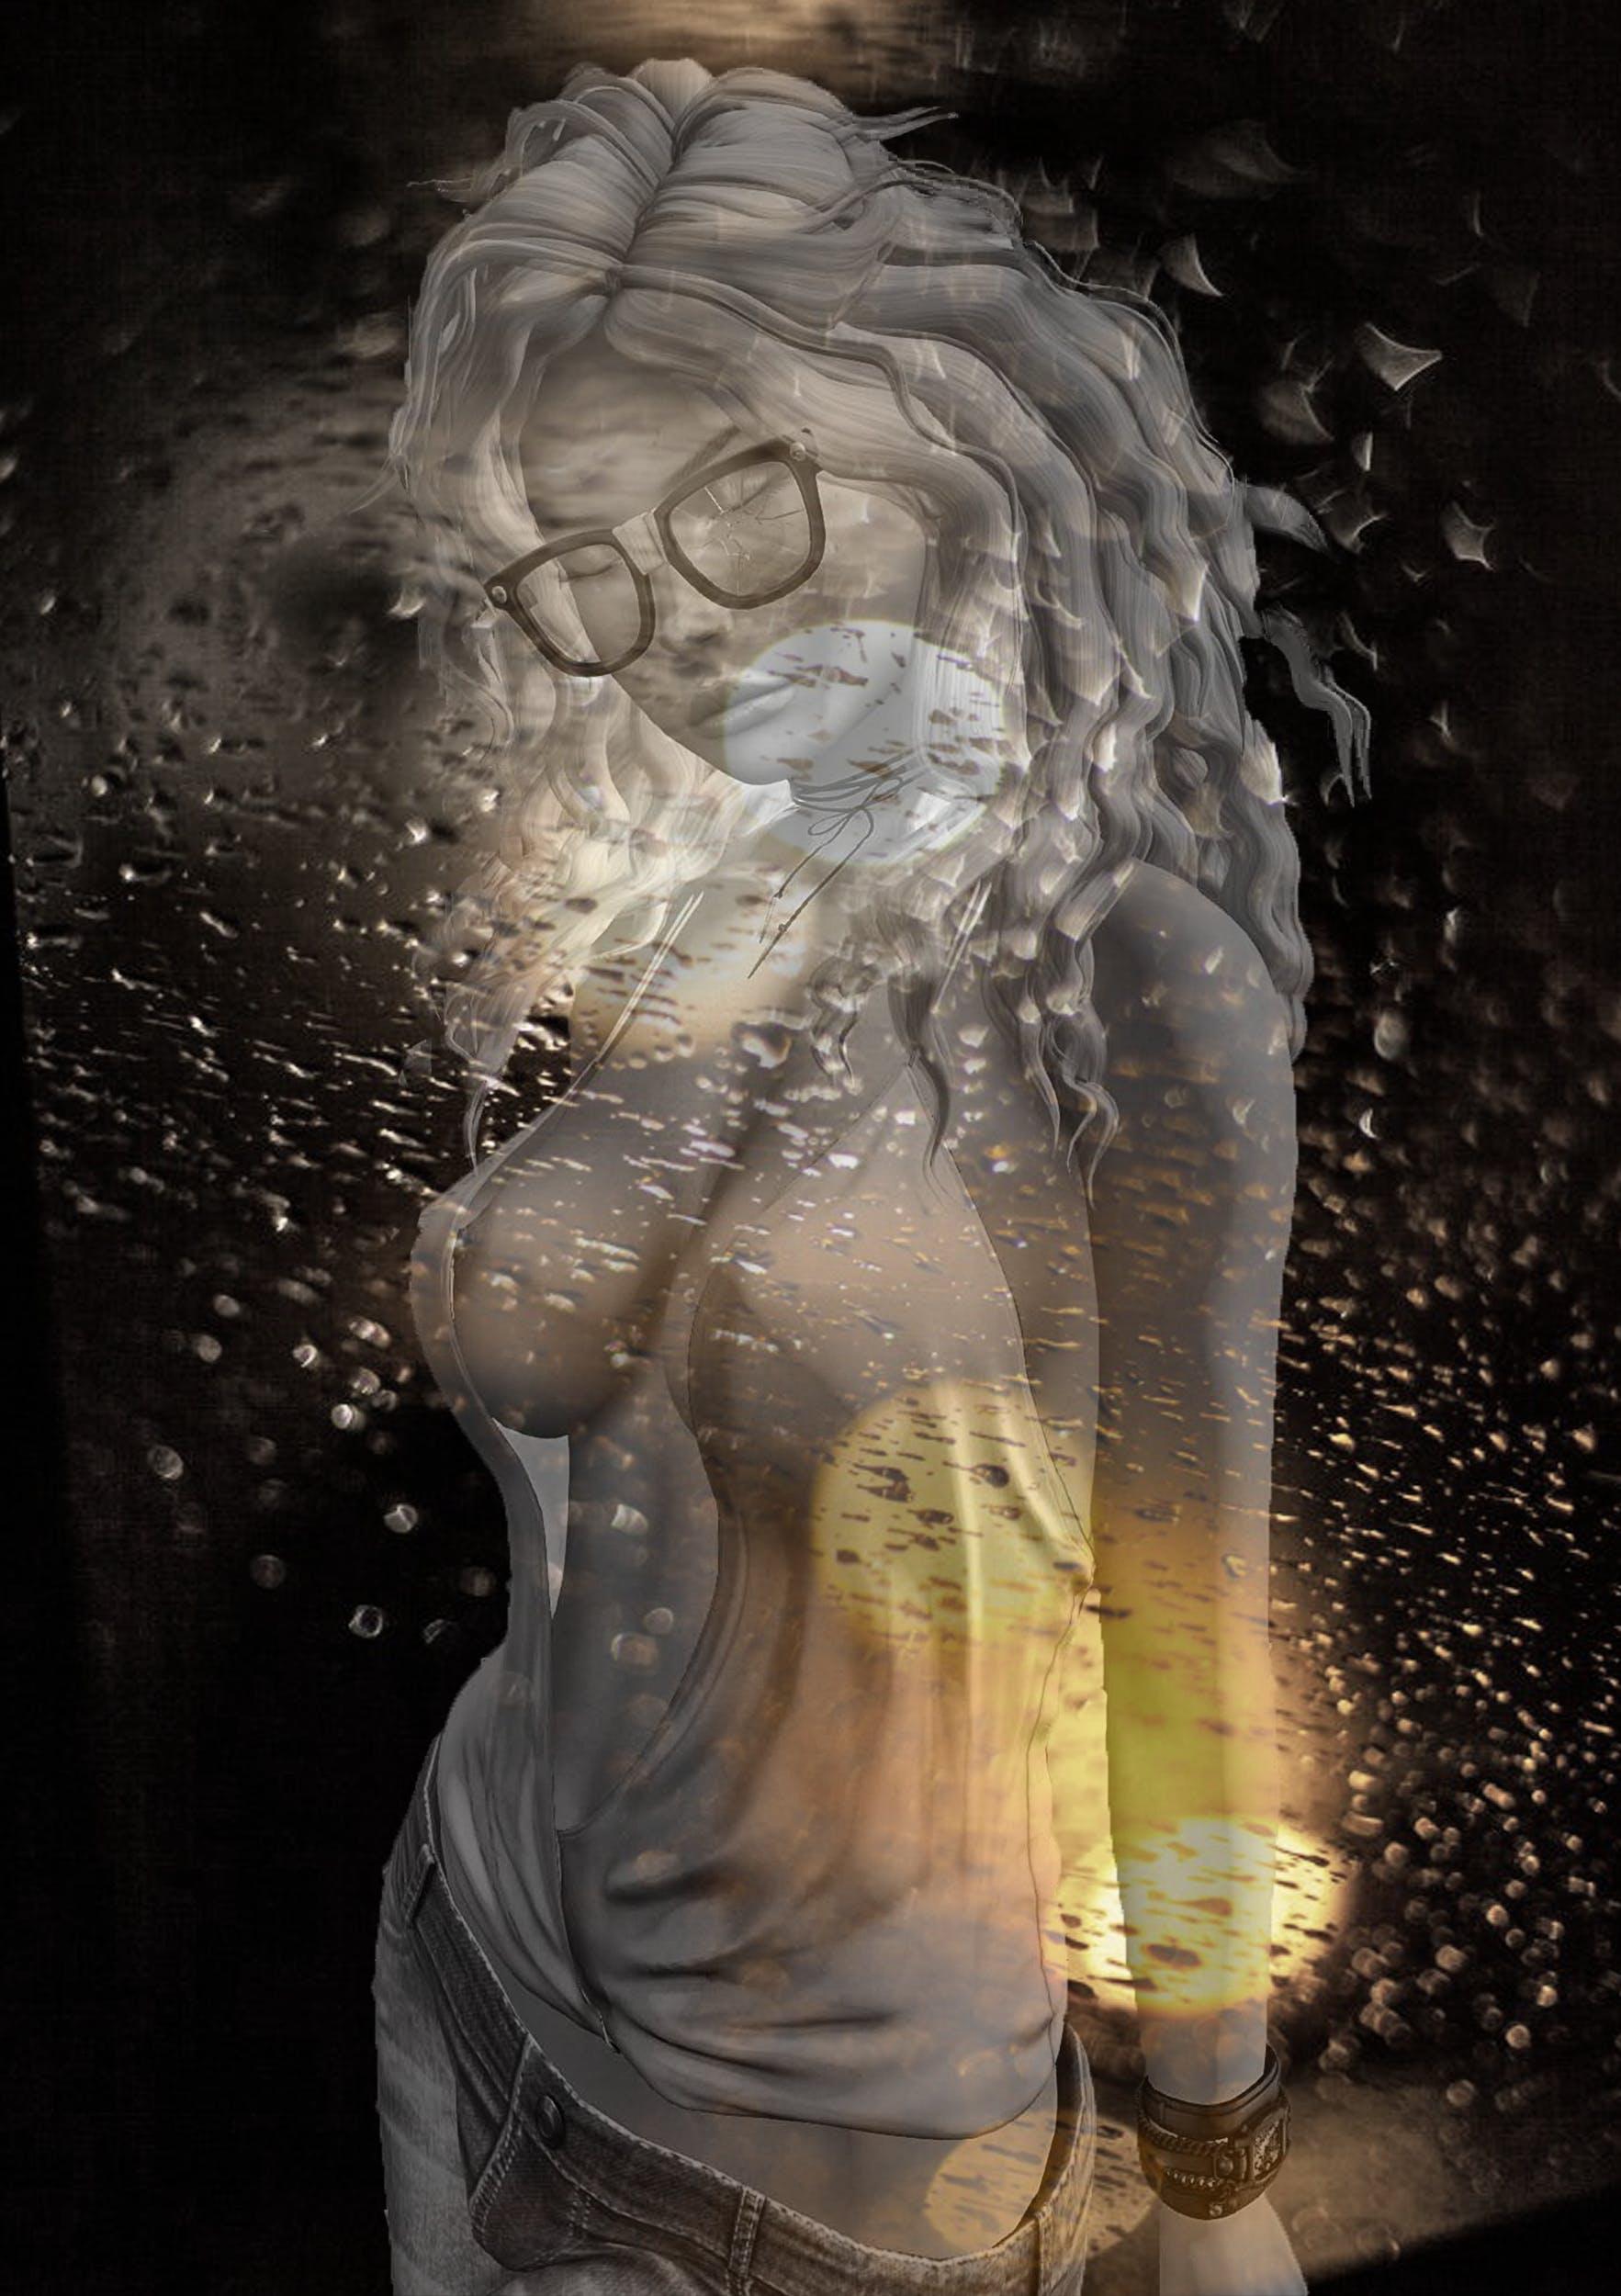 Free stock photo of abstract photo, digital art, woman